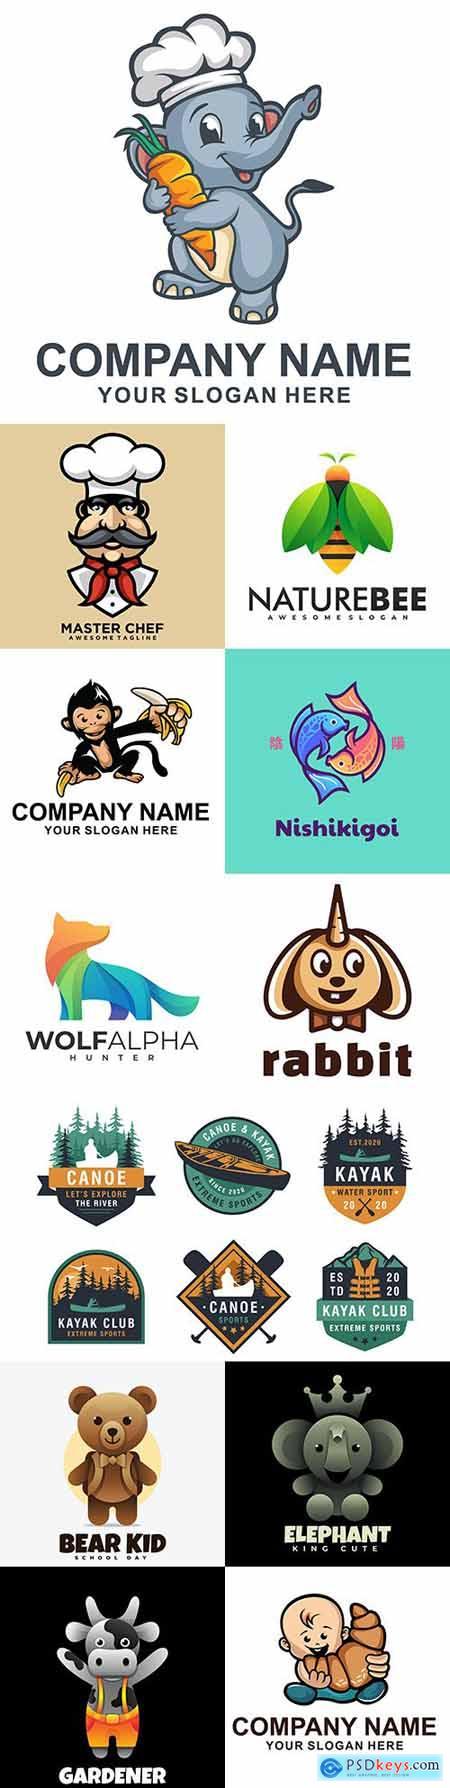 Brand name company business corporate logos design 16